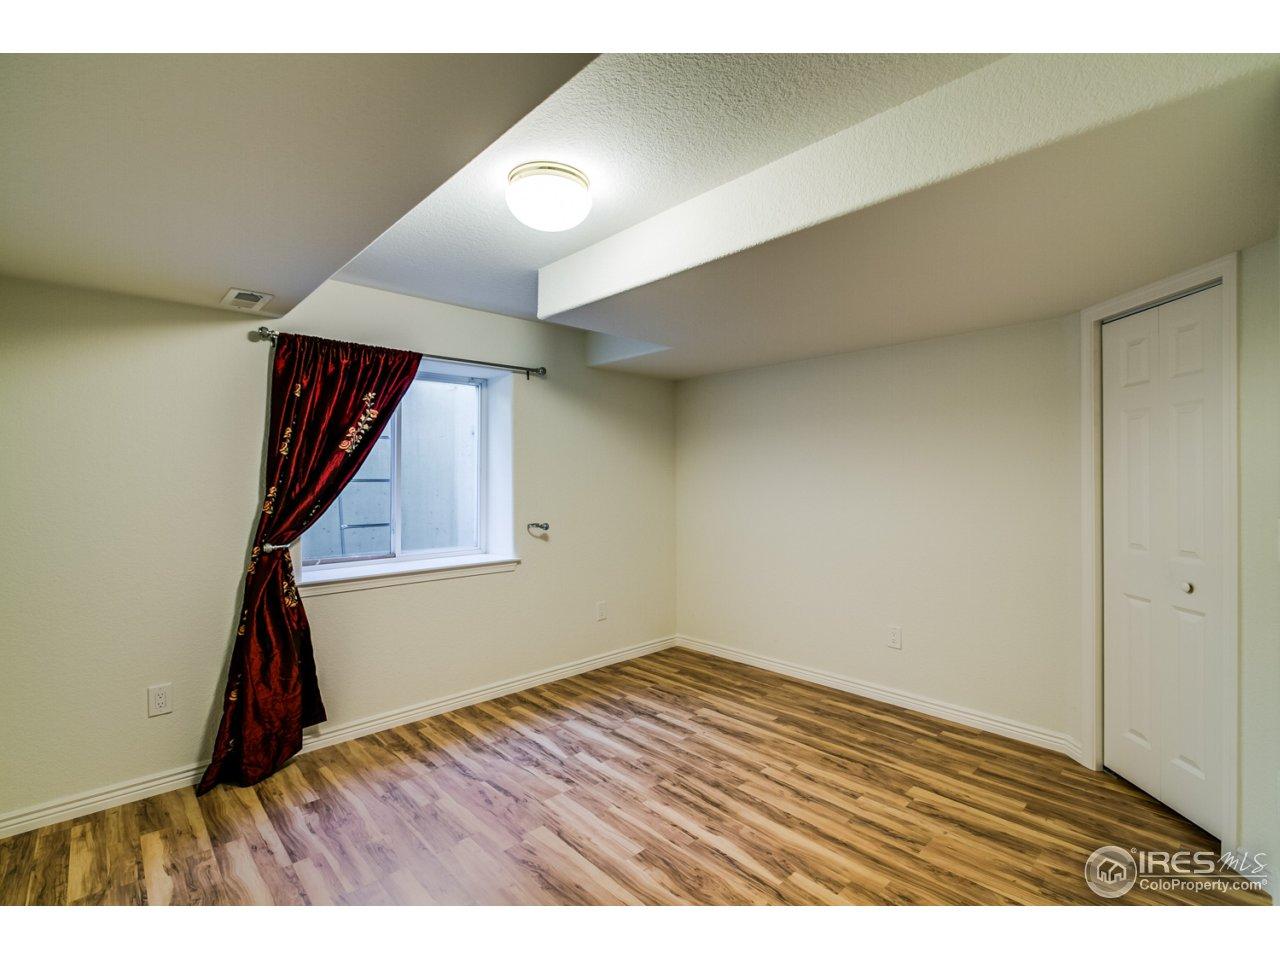 6th lower bedroom